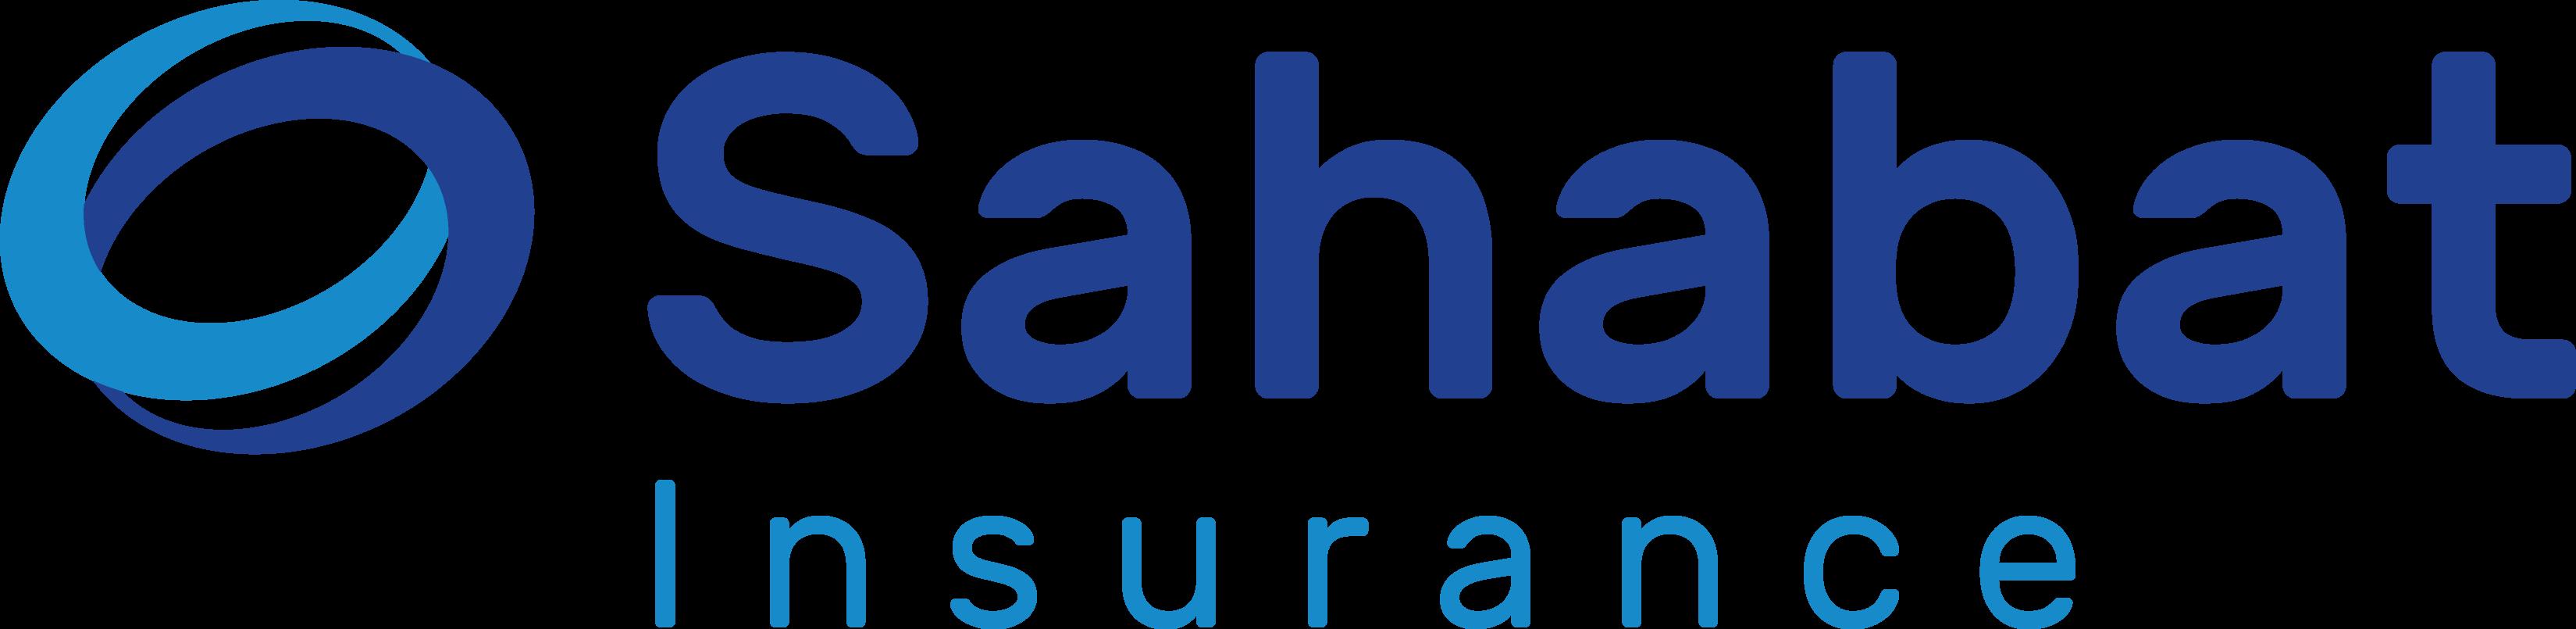 /images/logo/insurance_sahabat.png